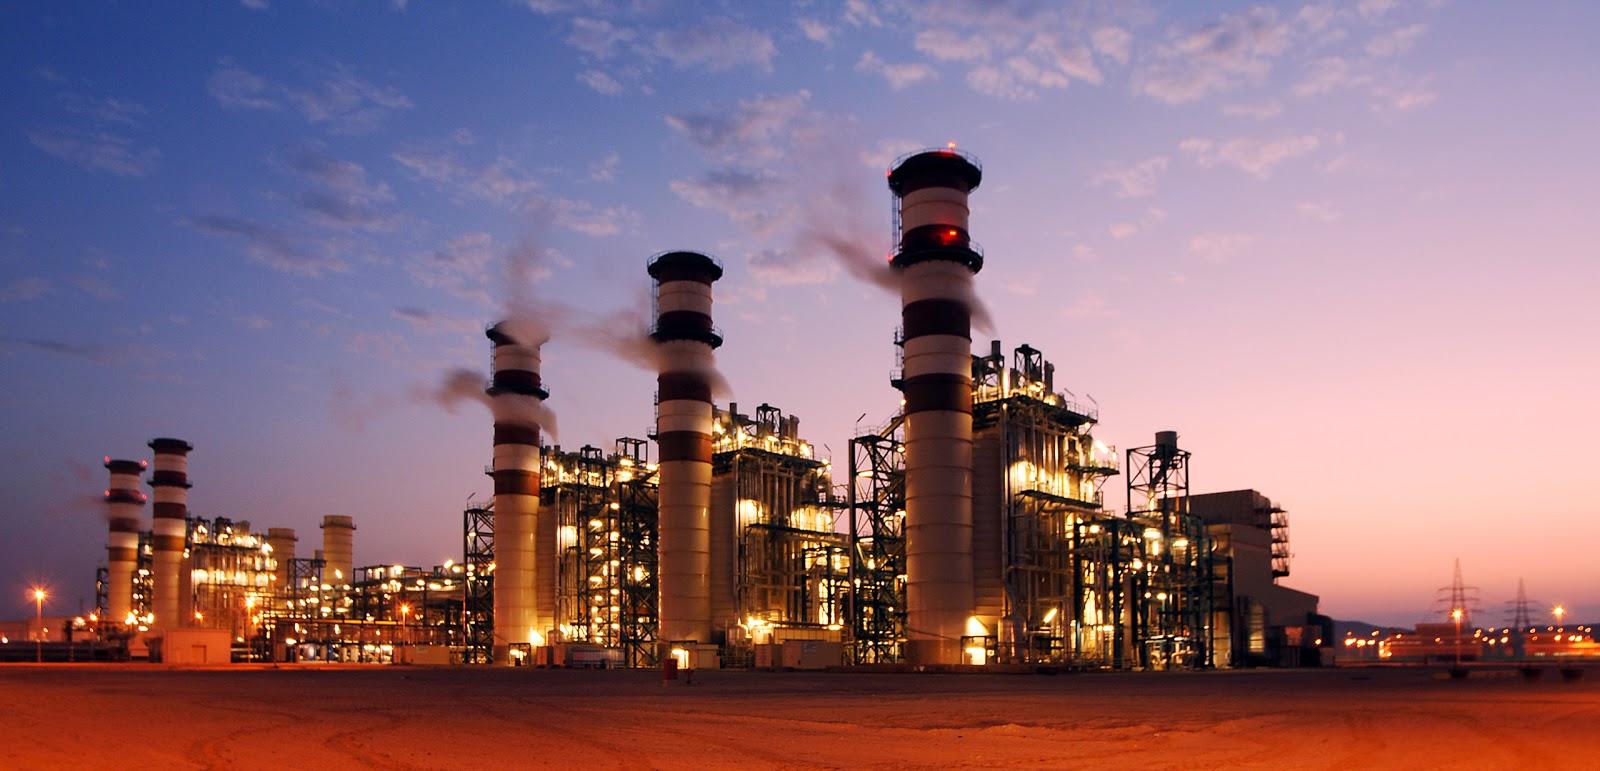 Bahrain - oil refinery   (photo-vimac.com.vn)